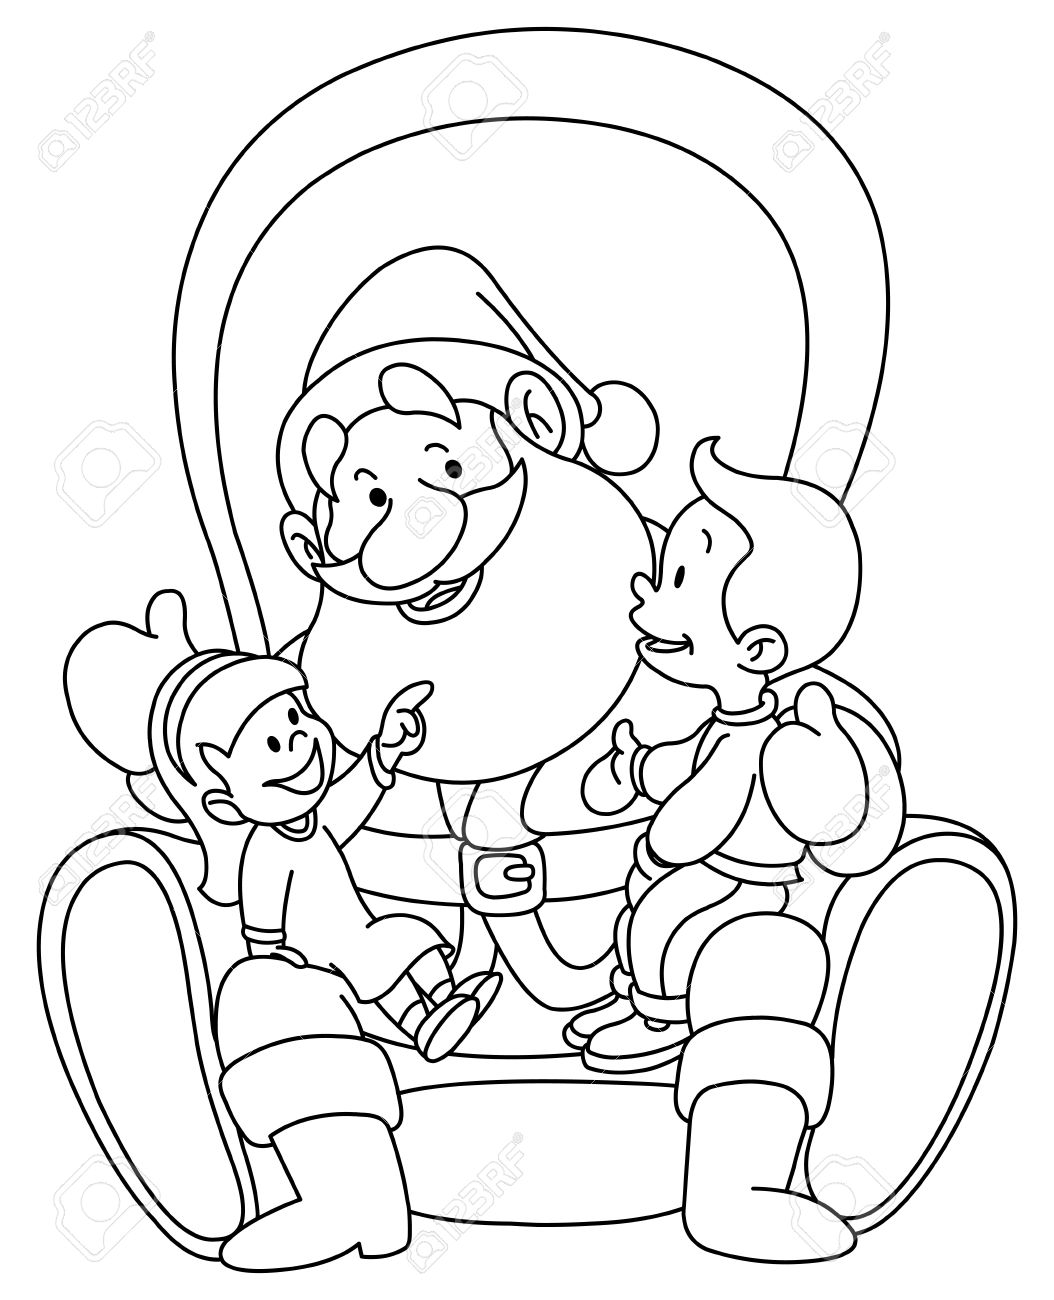 1054x1300 Outlined Illustration Of Kids Sitting On Santa Lap Coloring